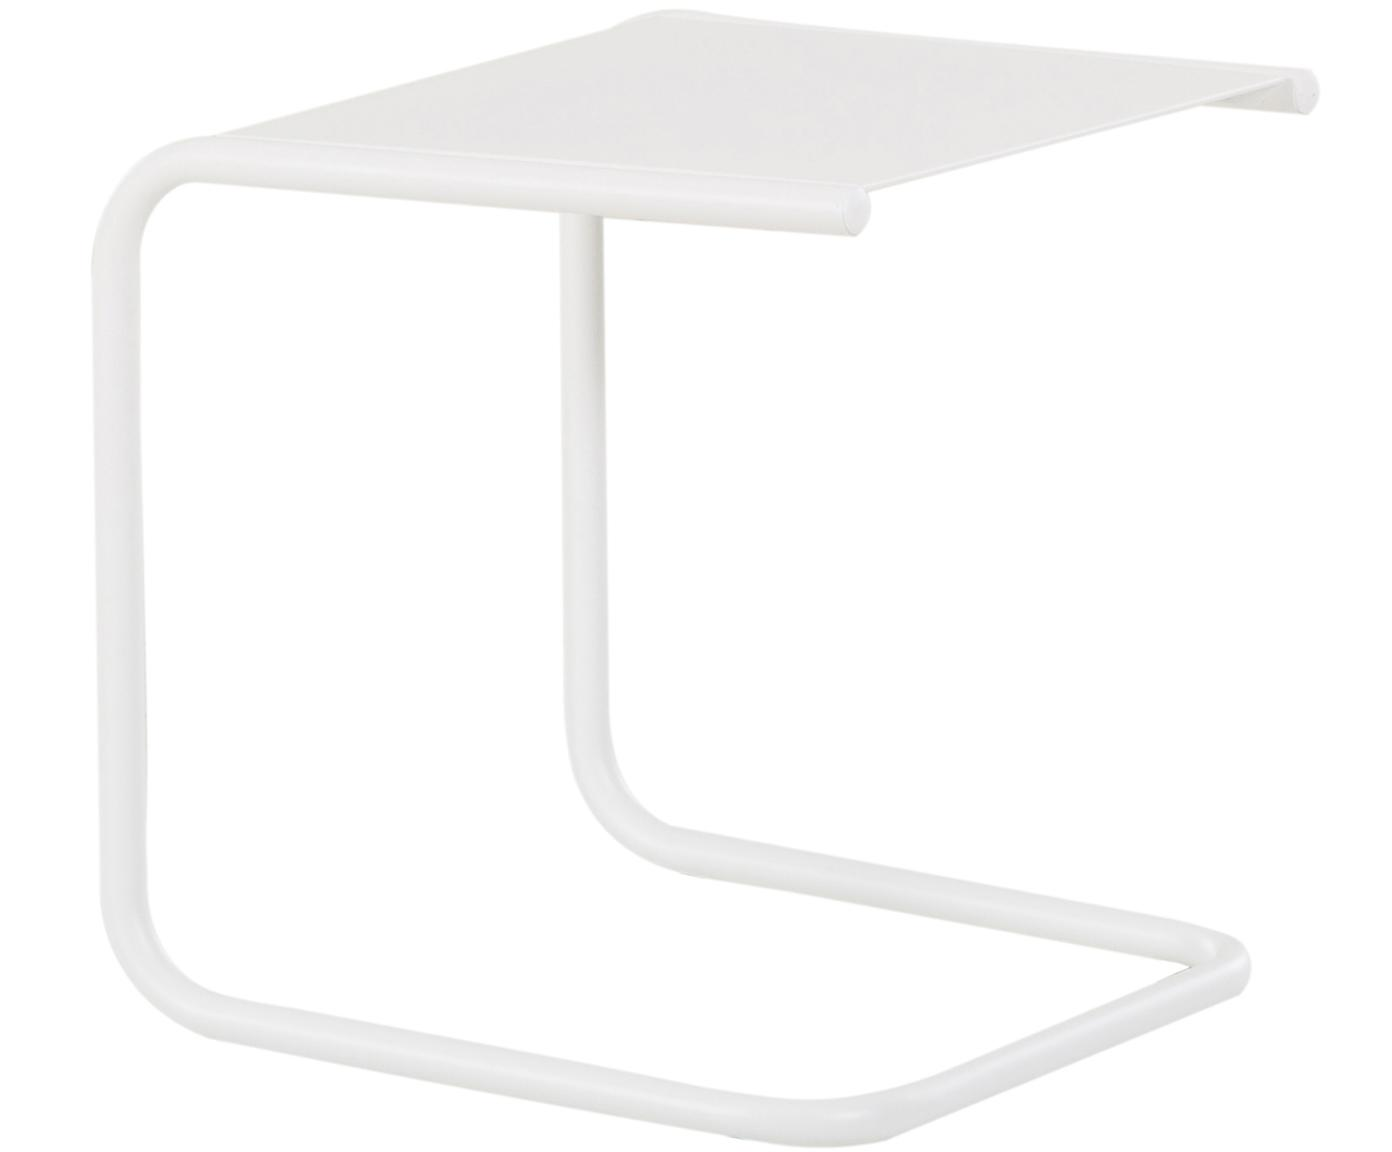 Mesa auxiliar de exterior de metal Club, Tablero: metal con pintura en polv, Estructura: aluminio con pintura en p, Blanco, An 40 x F 40 cm